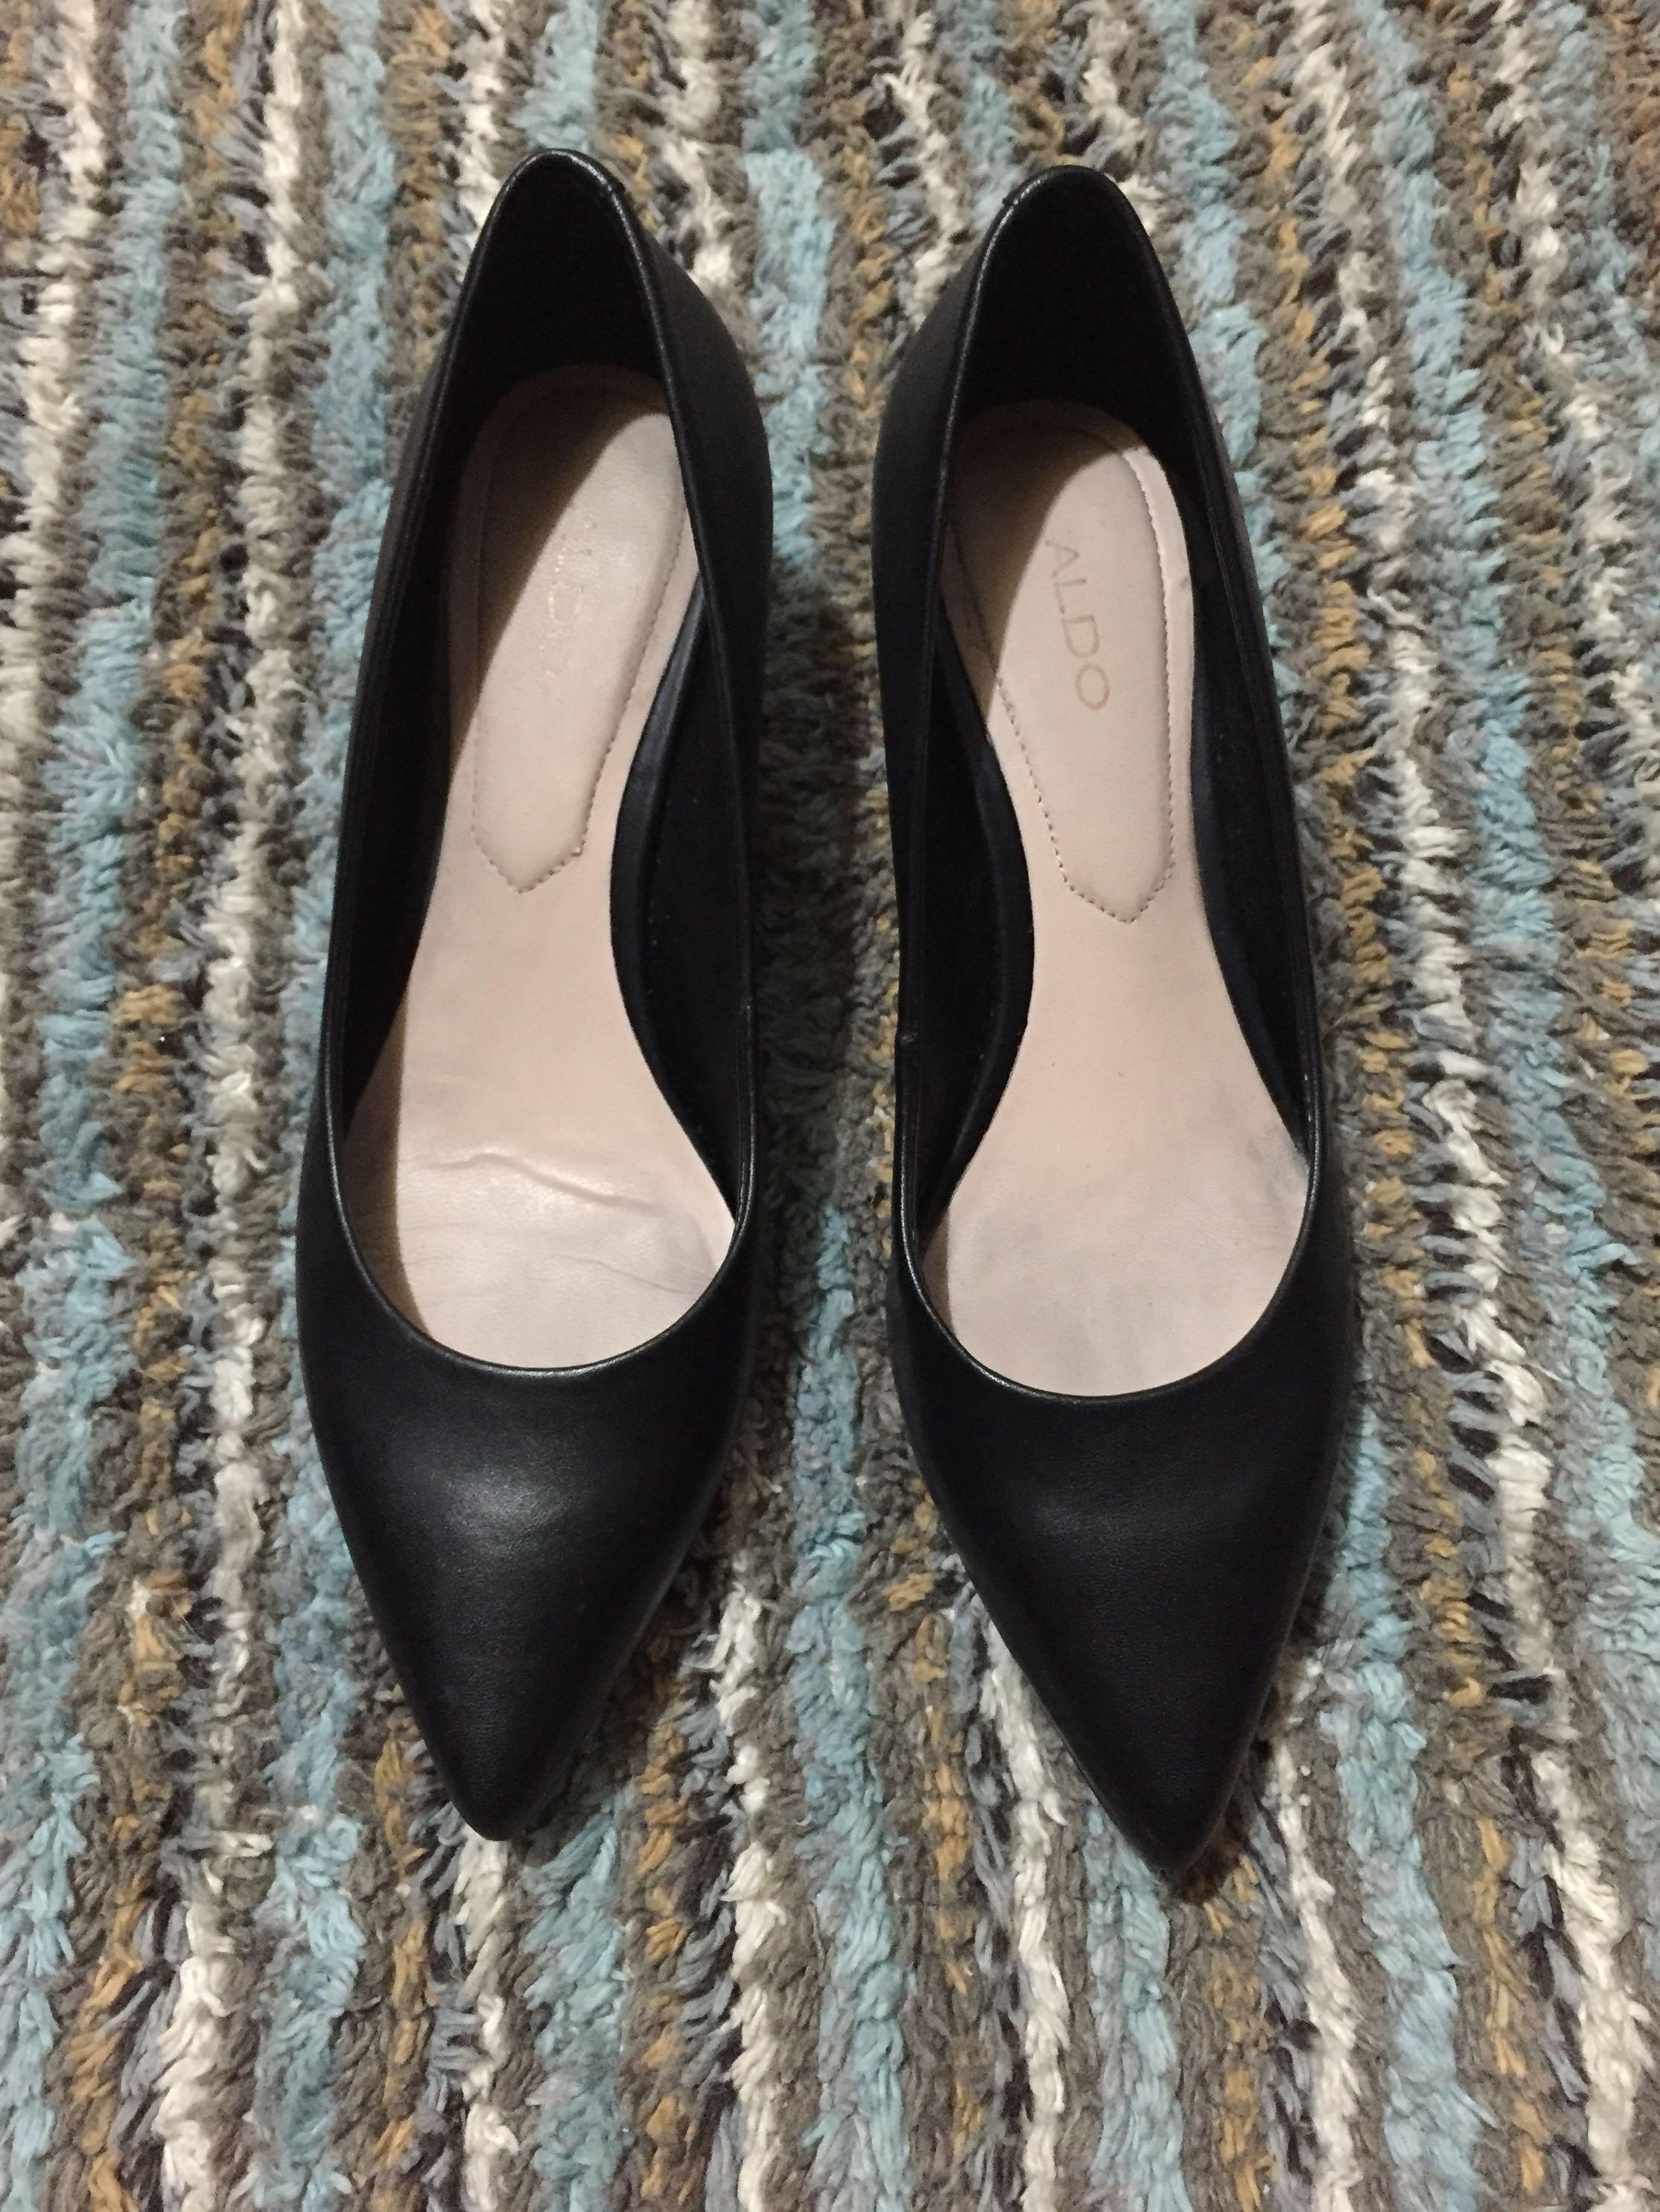 b5c66ad5ce62 Aldo Leather Kitten Heels